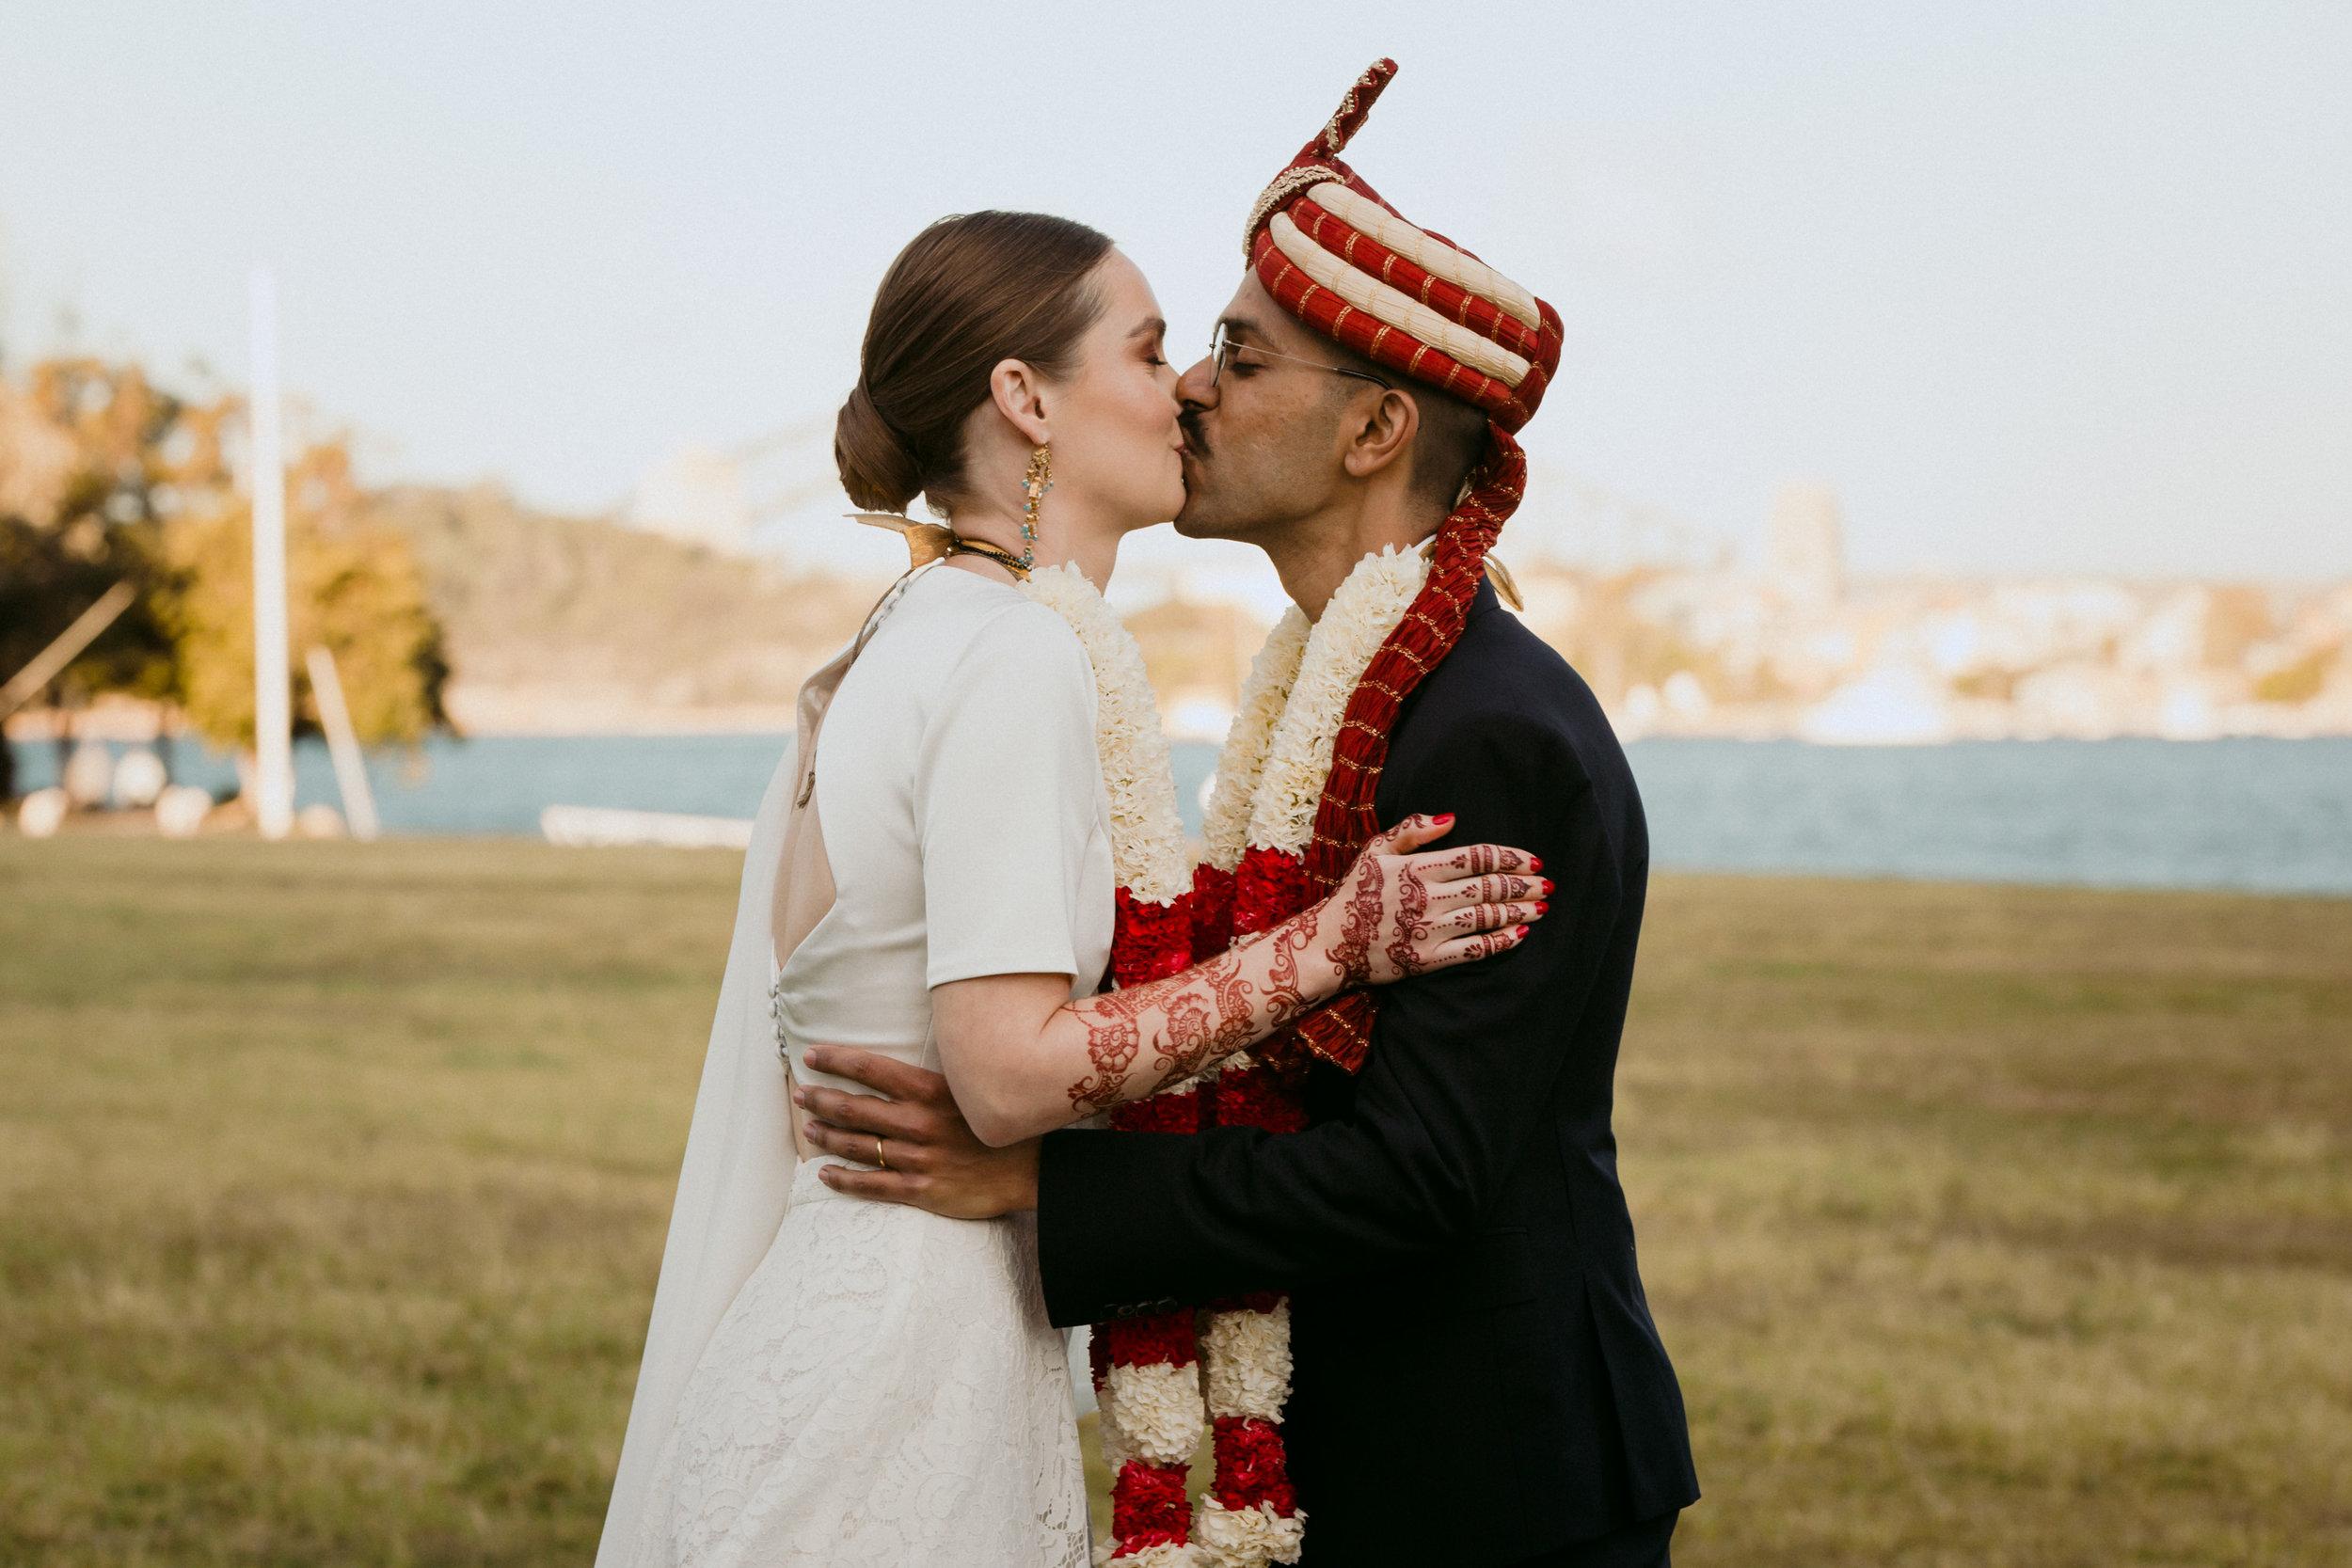 Amelia+Ani_Wedding_May2019_credit_OneDaySomewherePhotography-66.jpg